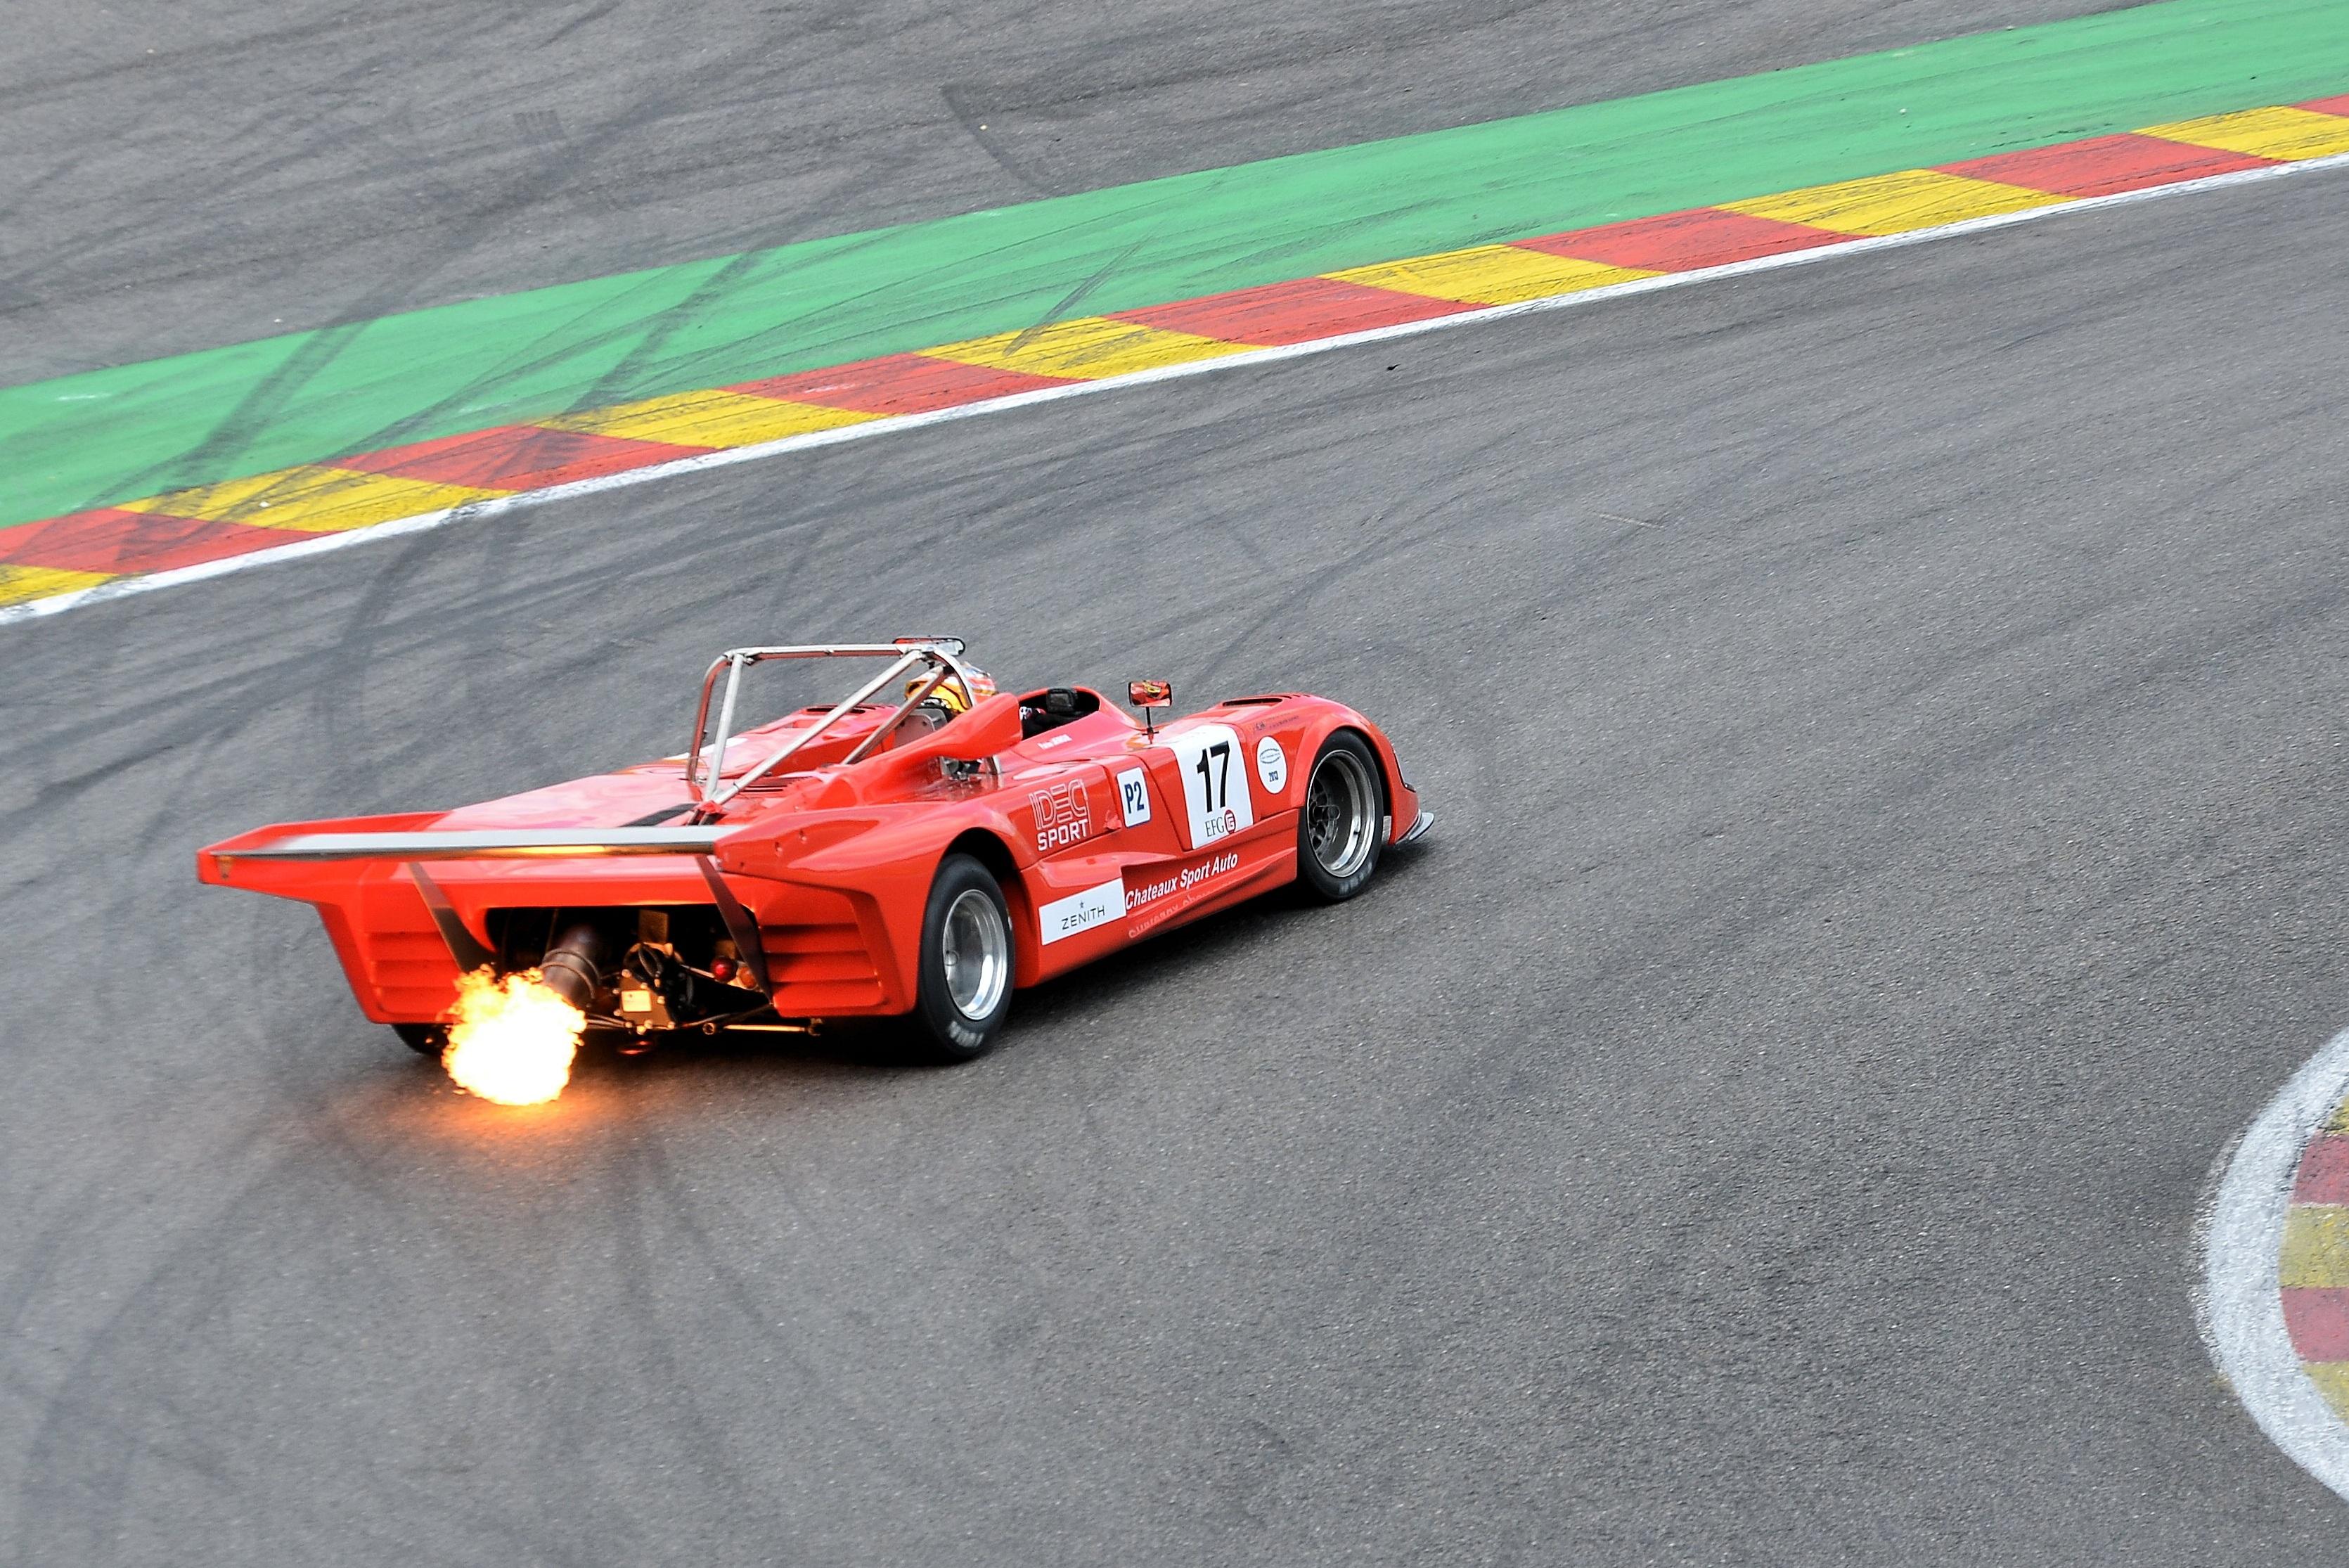 Free Images : old, nostalgia, sports car, race car, supercar, motor ...